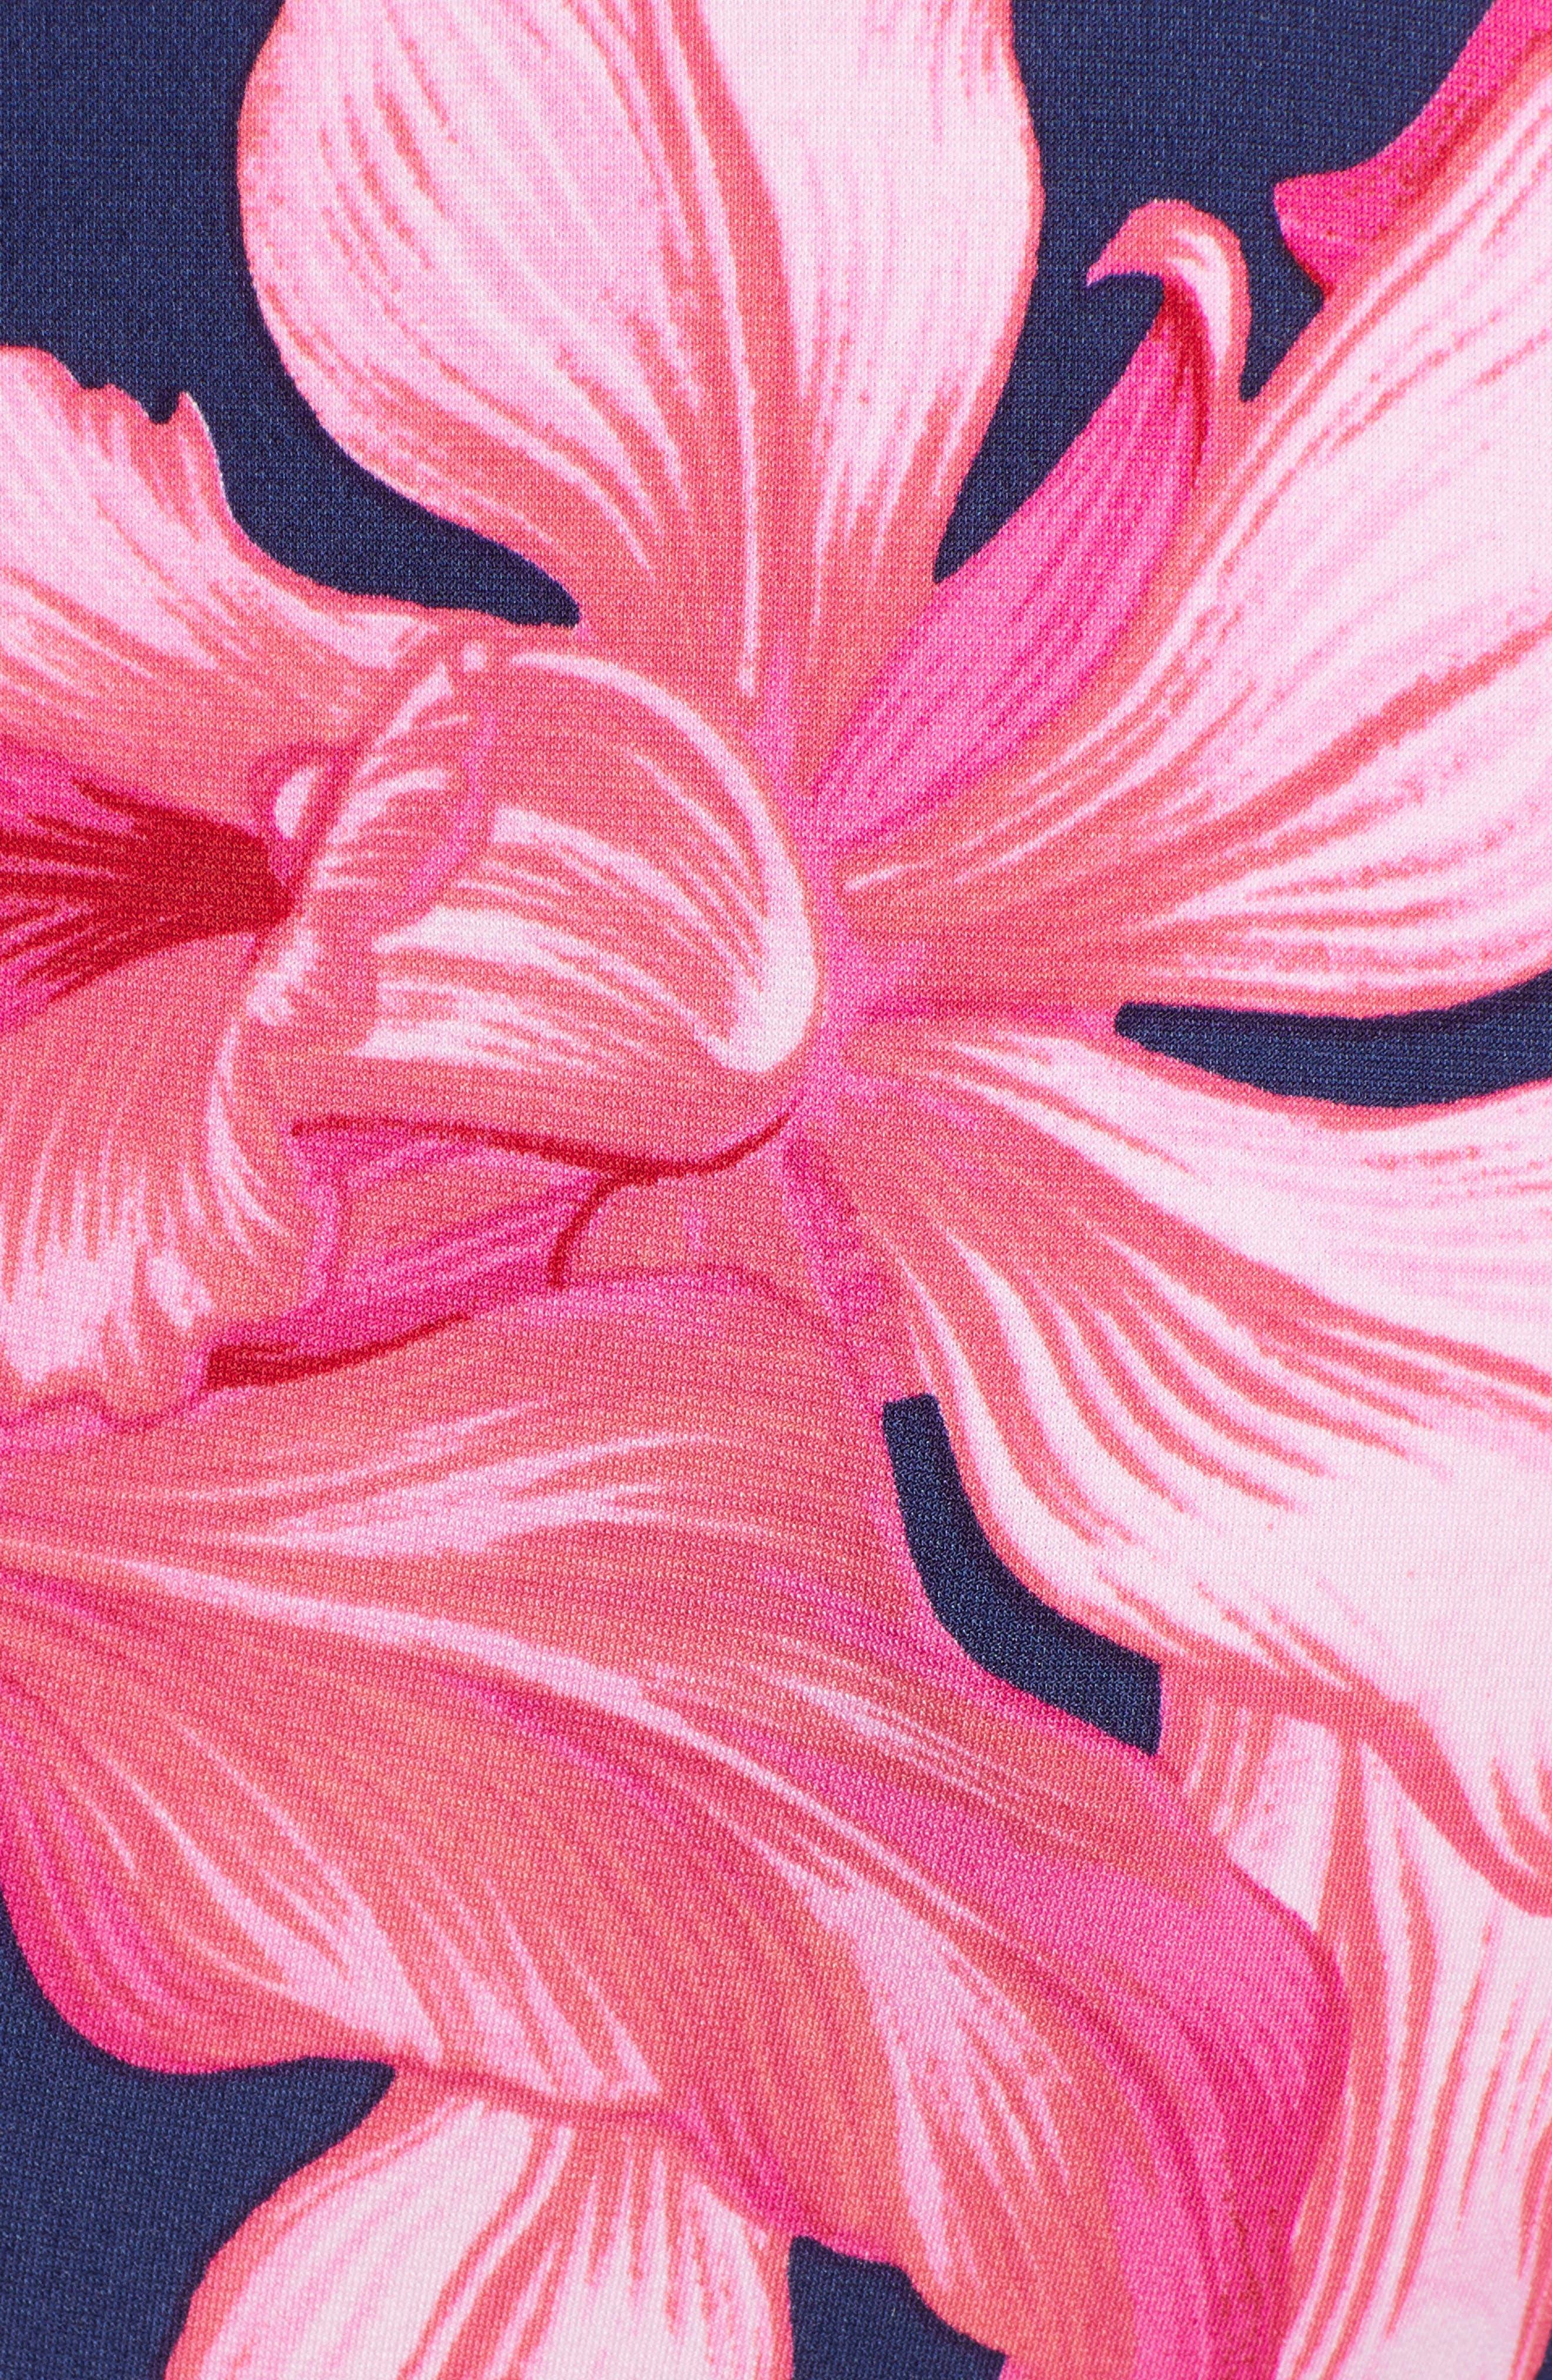 Orchid Rua Maxi Dress,                             Alternate thumbnail 6, color,                             ISLAND NAVY